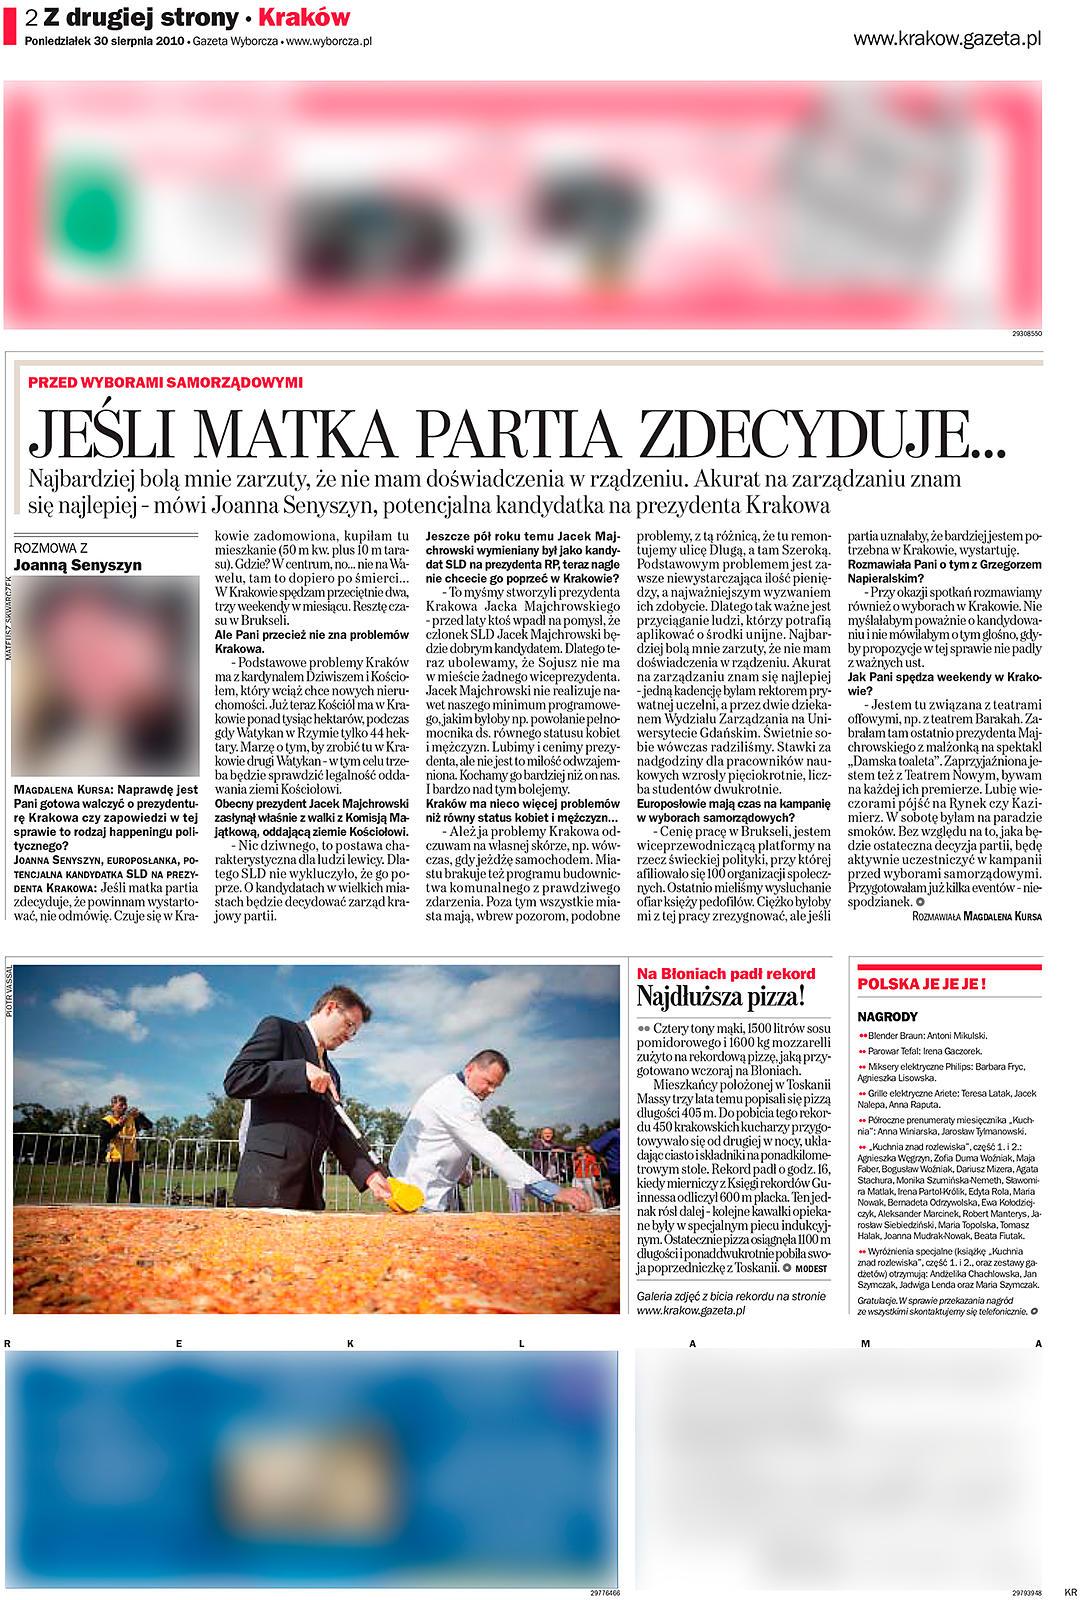 Pierre Vassal | DLO_KR_30_08:Krakow qxd PS-FILE: job-10 31 29 125